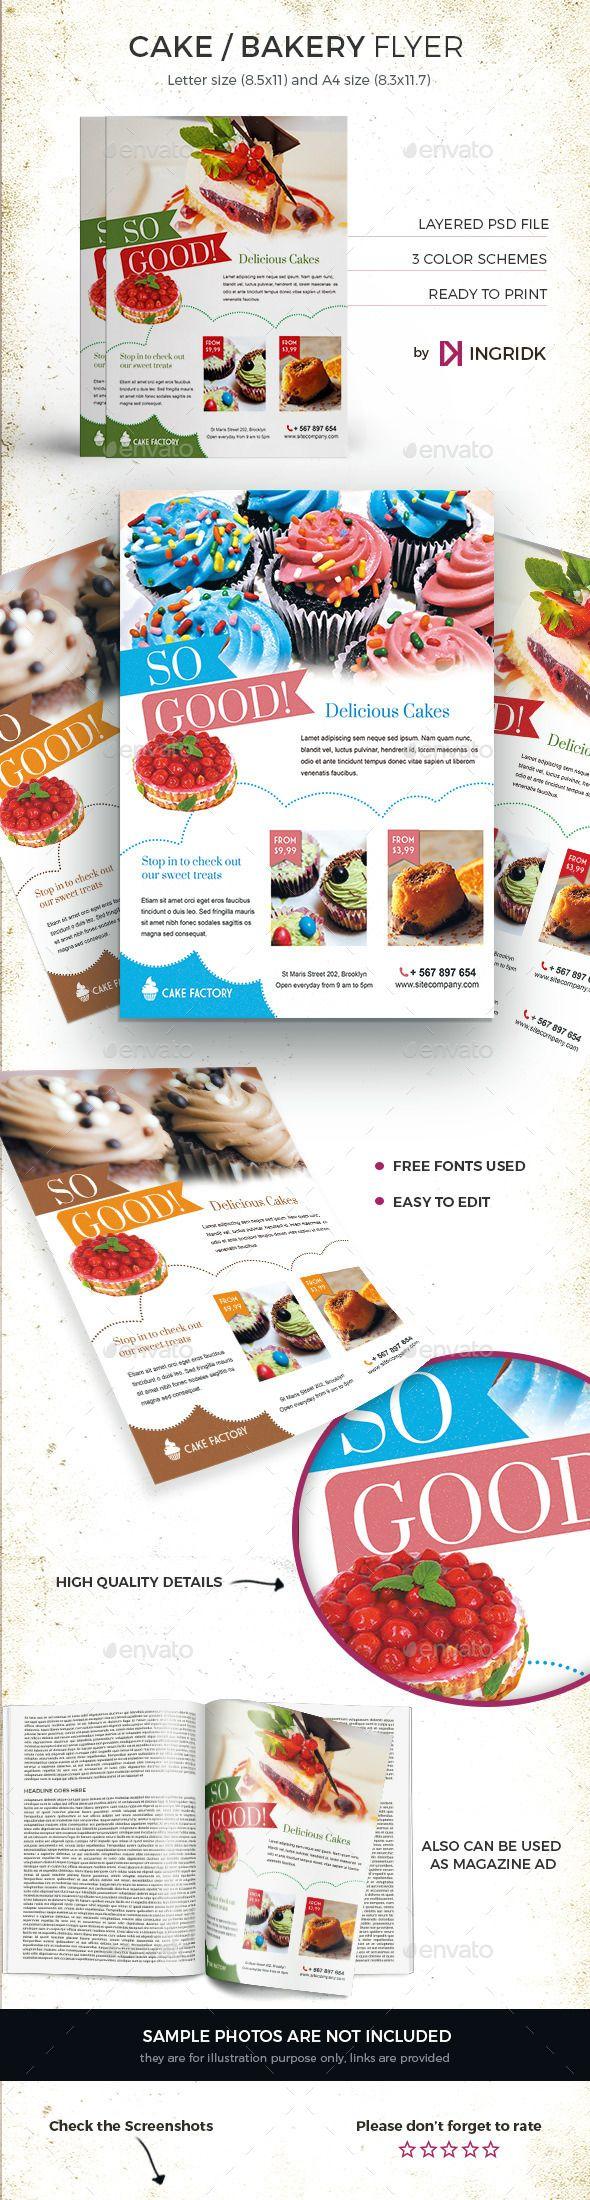 Cake / Bakery Flyer or Magazine Ad Tempalte #design Download: http://graphicriver.net/item/cake-bakery-flyer-or-magazine-ad/12486613?ref=ksioks